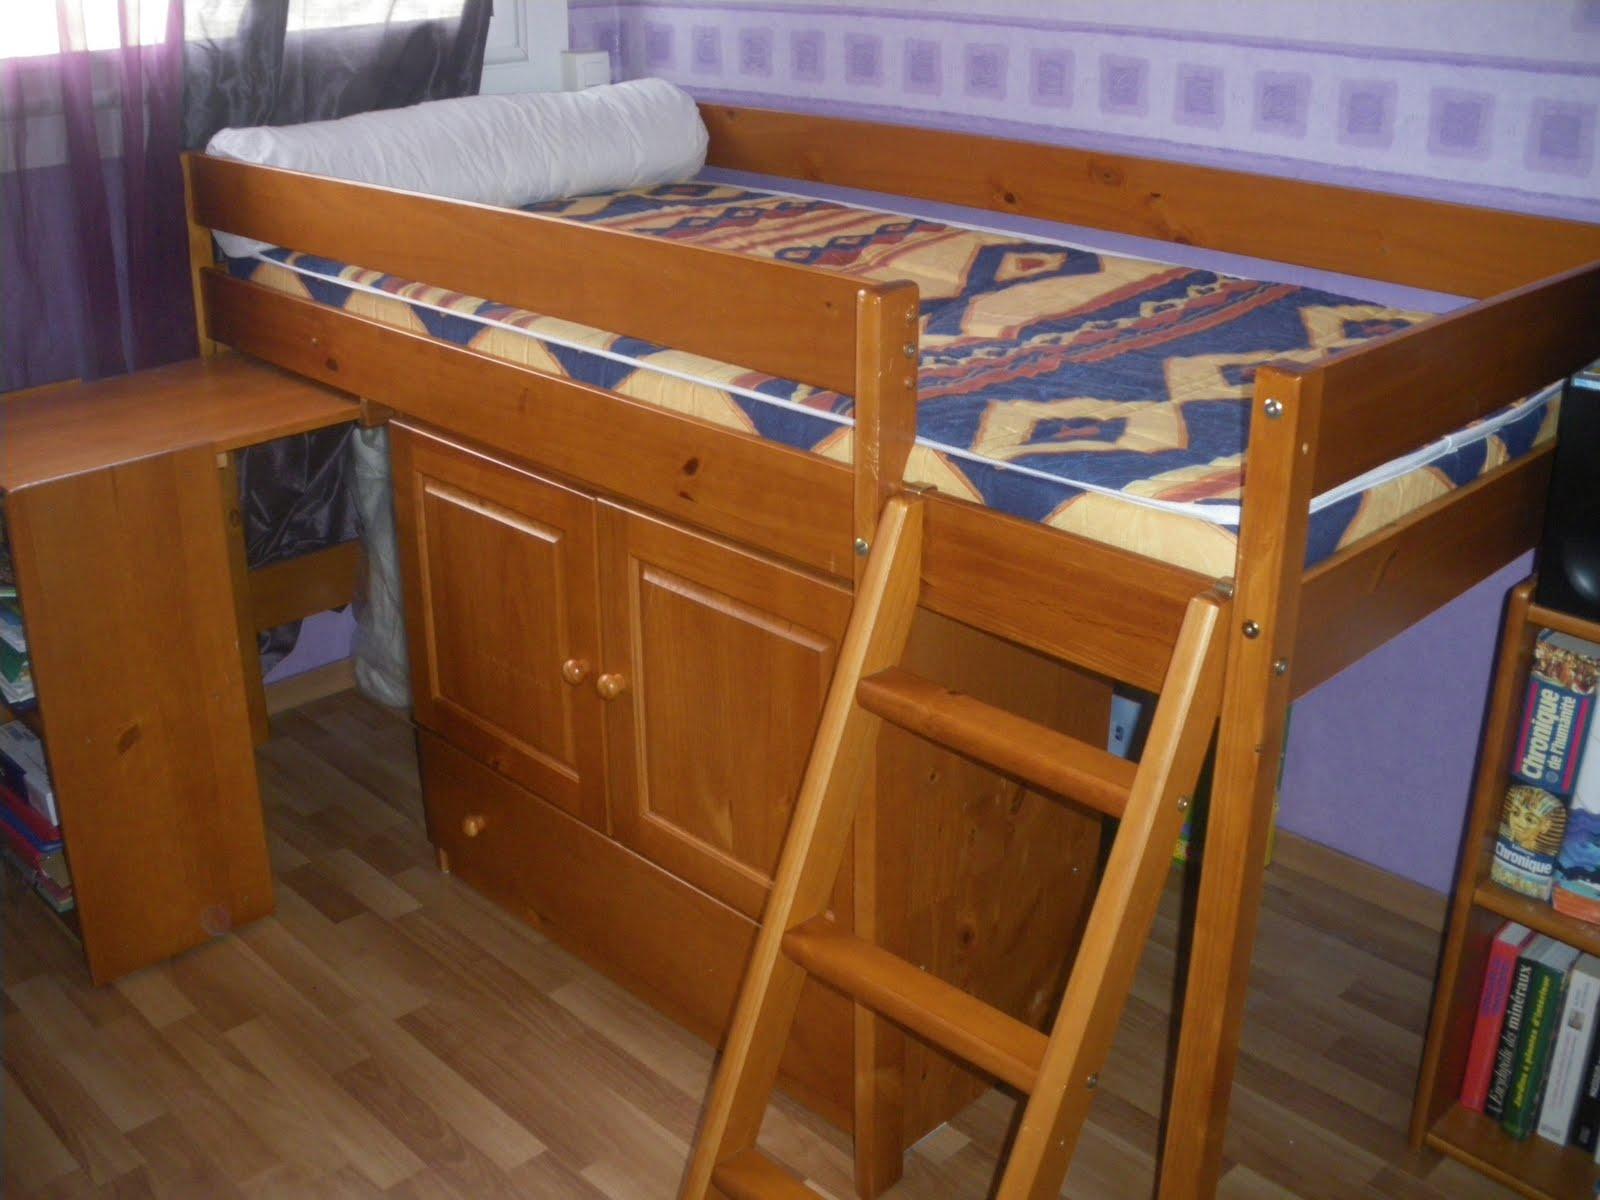 castelroc news vend combin lit bureau ling re pin massif. Black Bedroom Furniture Sets. Home Design Ideas